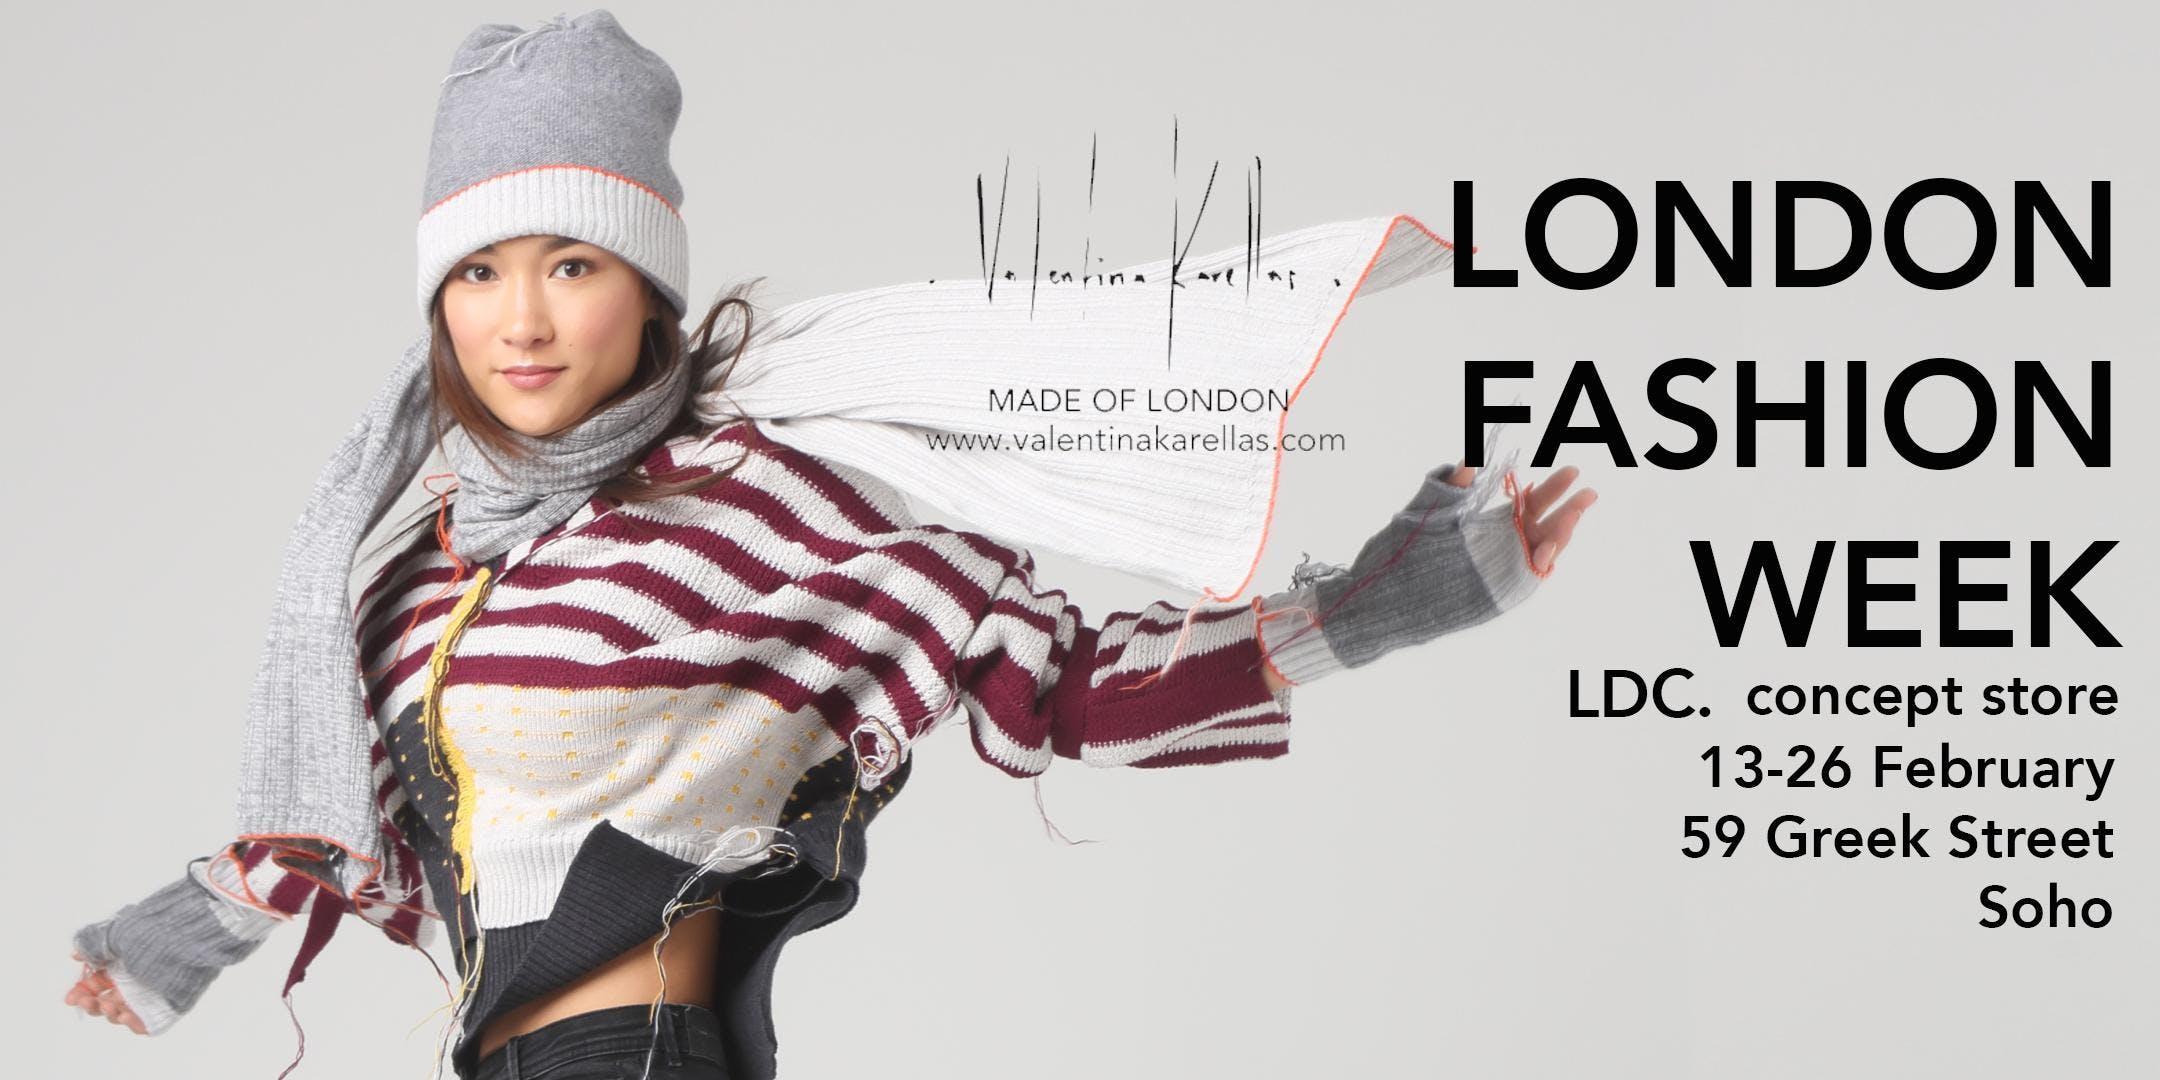 LONDON FASHION WEEK- Valentina Karellas joins Lone Design Club + Concept Store